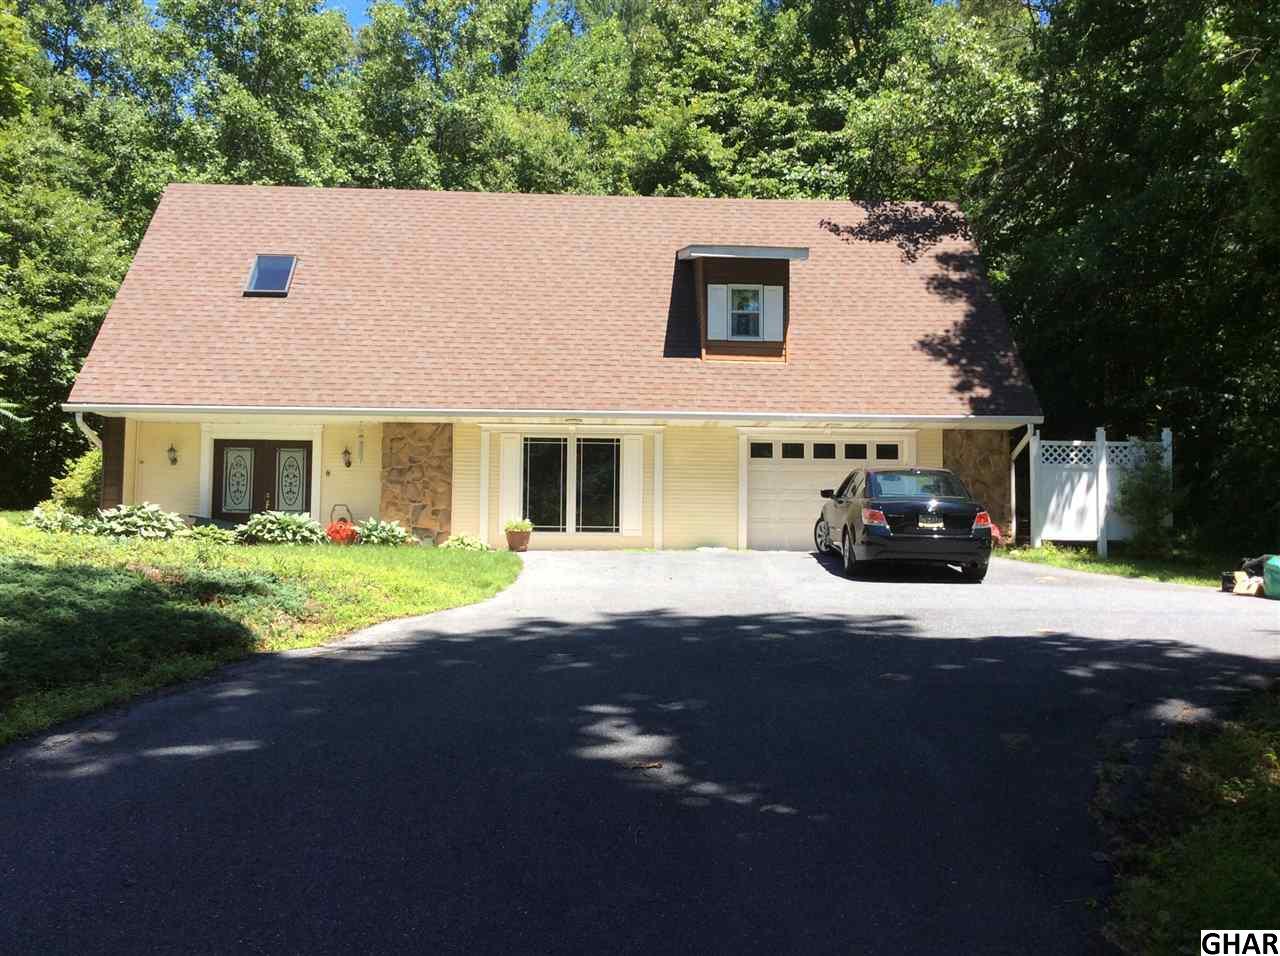 Real Estate for Sale, ListingId: 34065329, Dauphin,PA17018